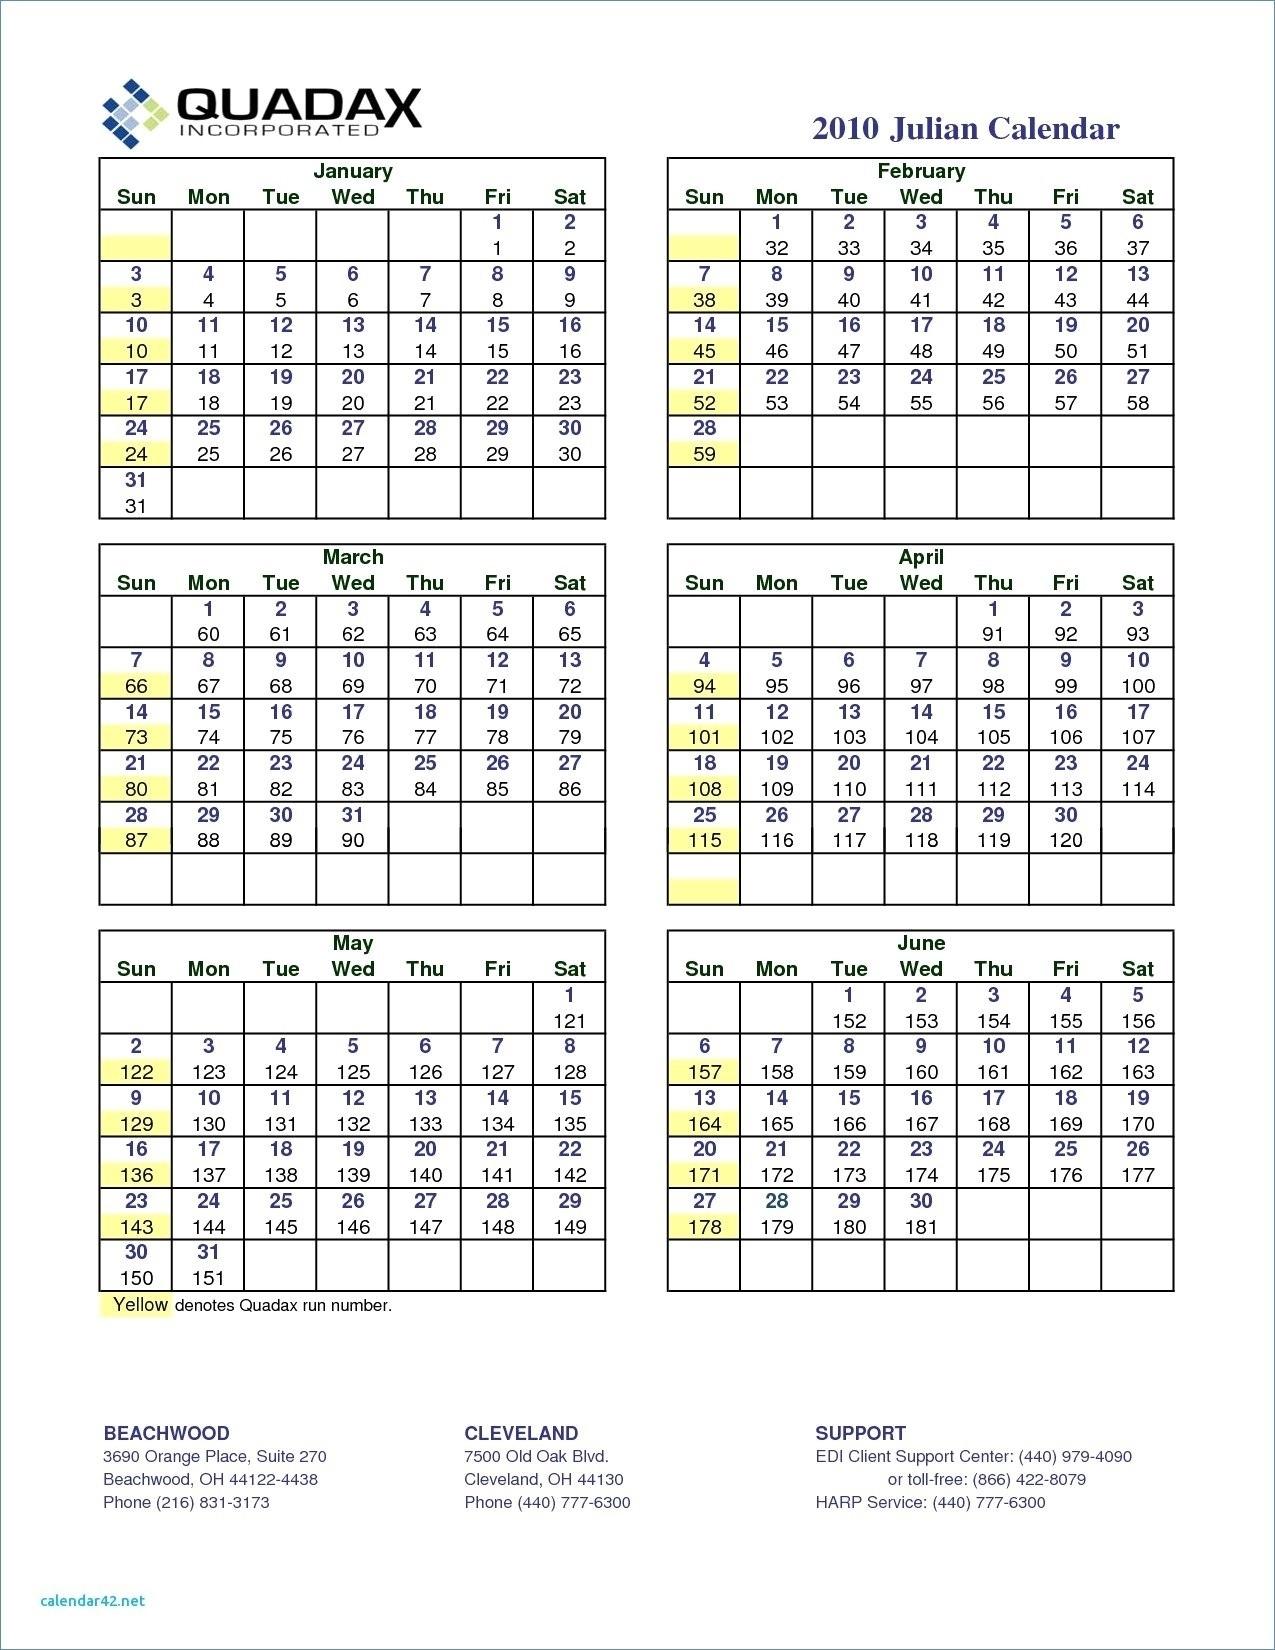 Quadax Julian Calendar 2020 Pdf | Free Printable Calendar